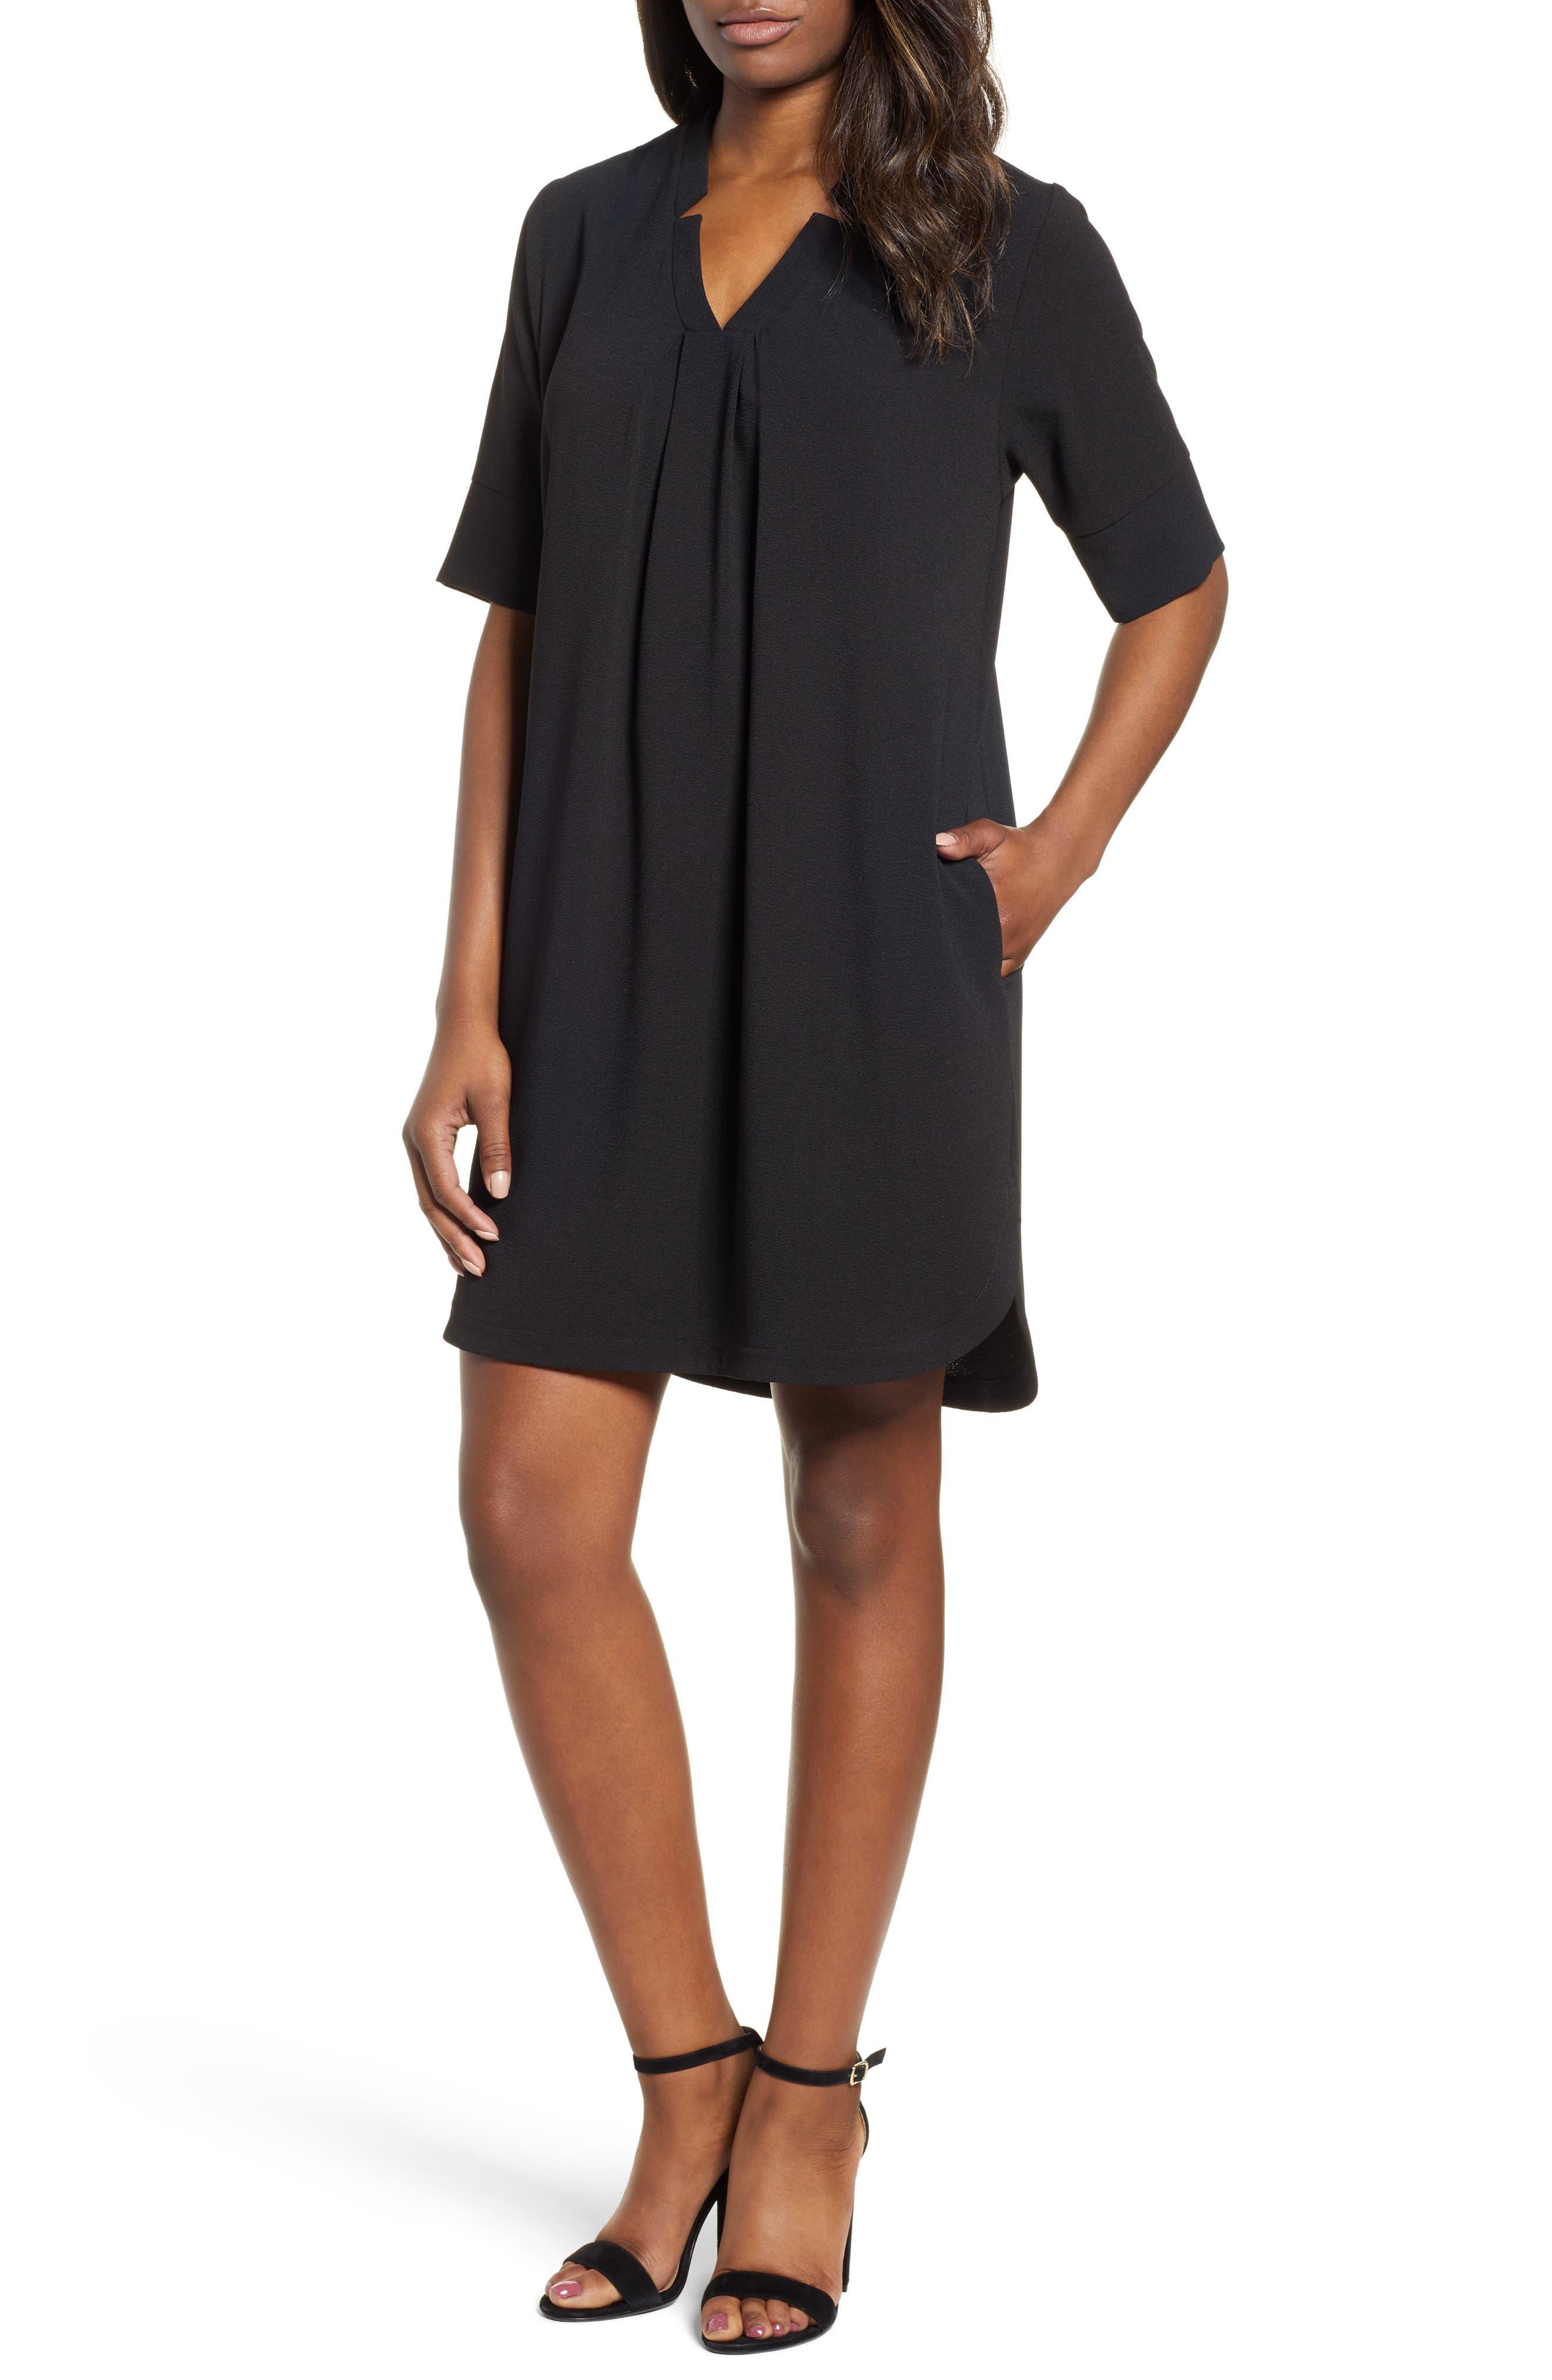 BOBEAU Pleat Front Curved Hem Shirtdress, Main, color, BLACK